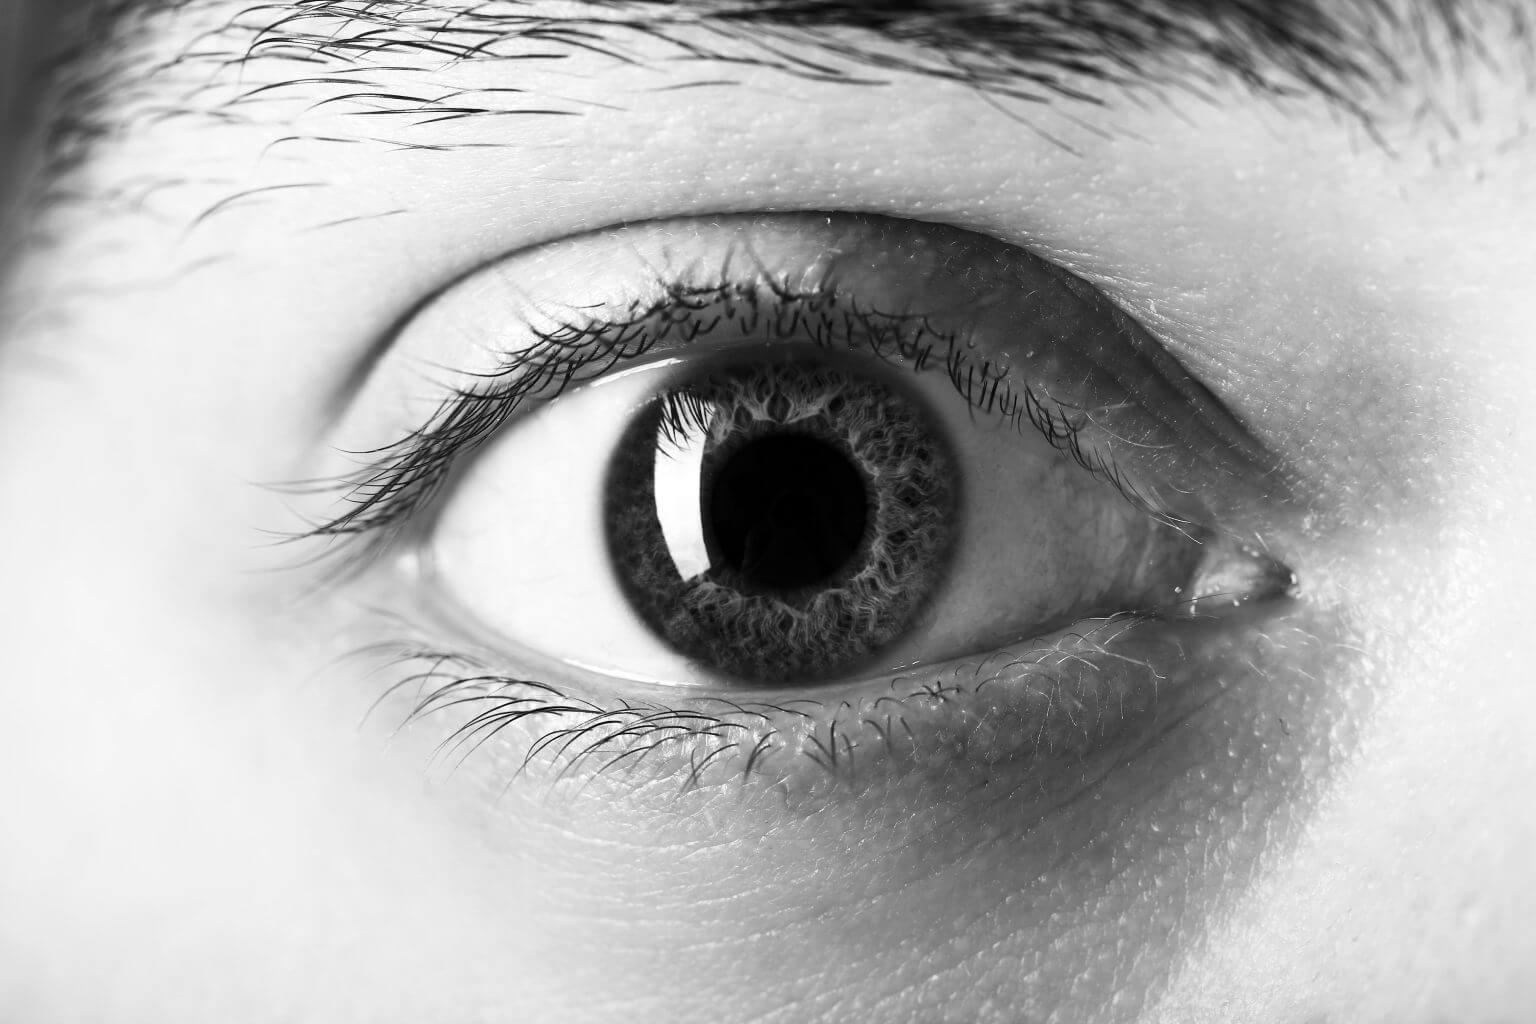 Wet macular degeneration - Low Vision Specialist Blog